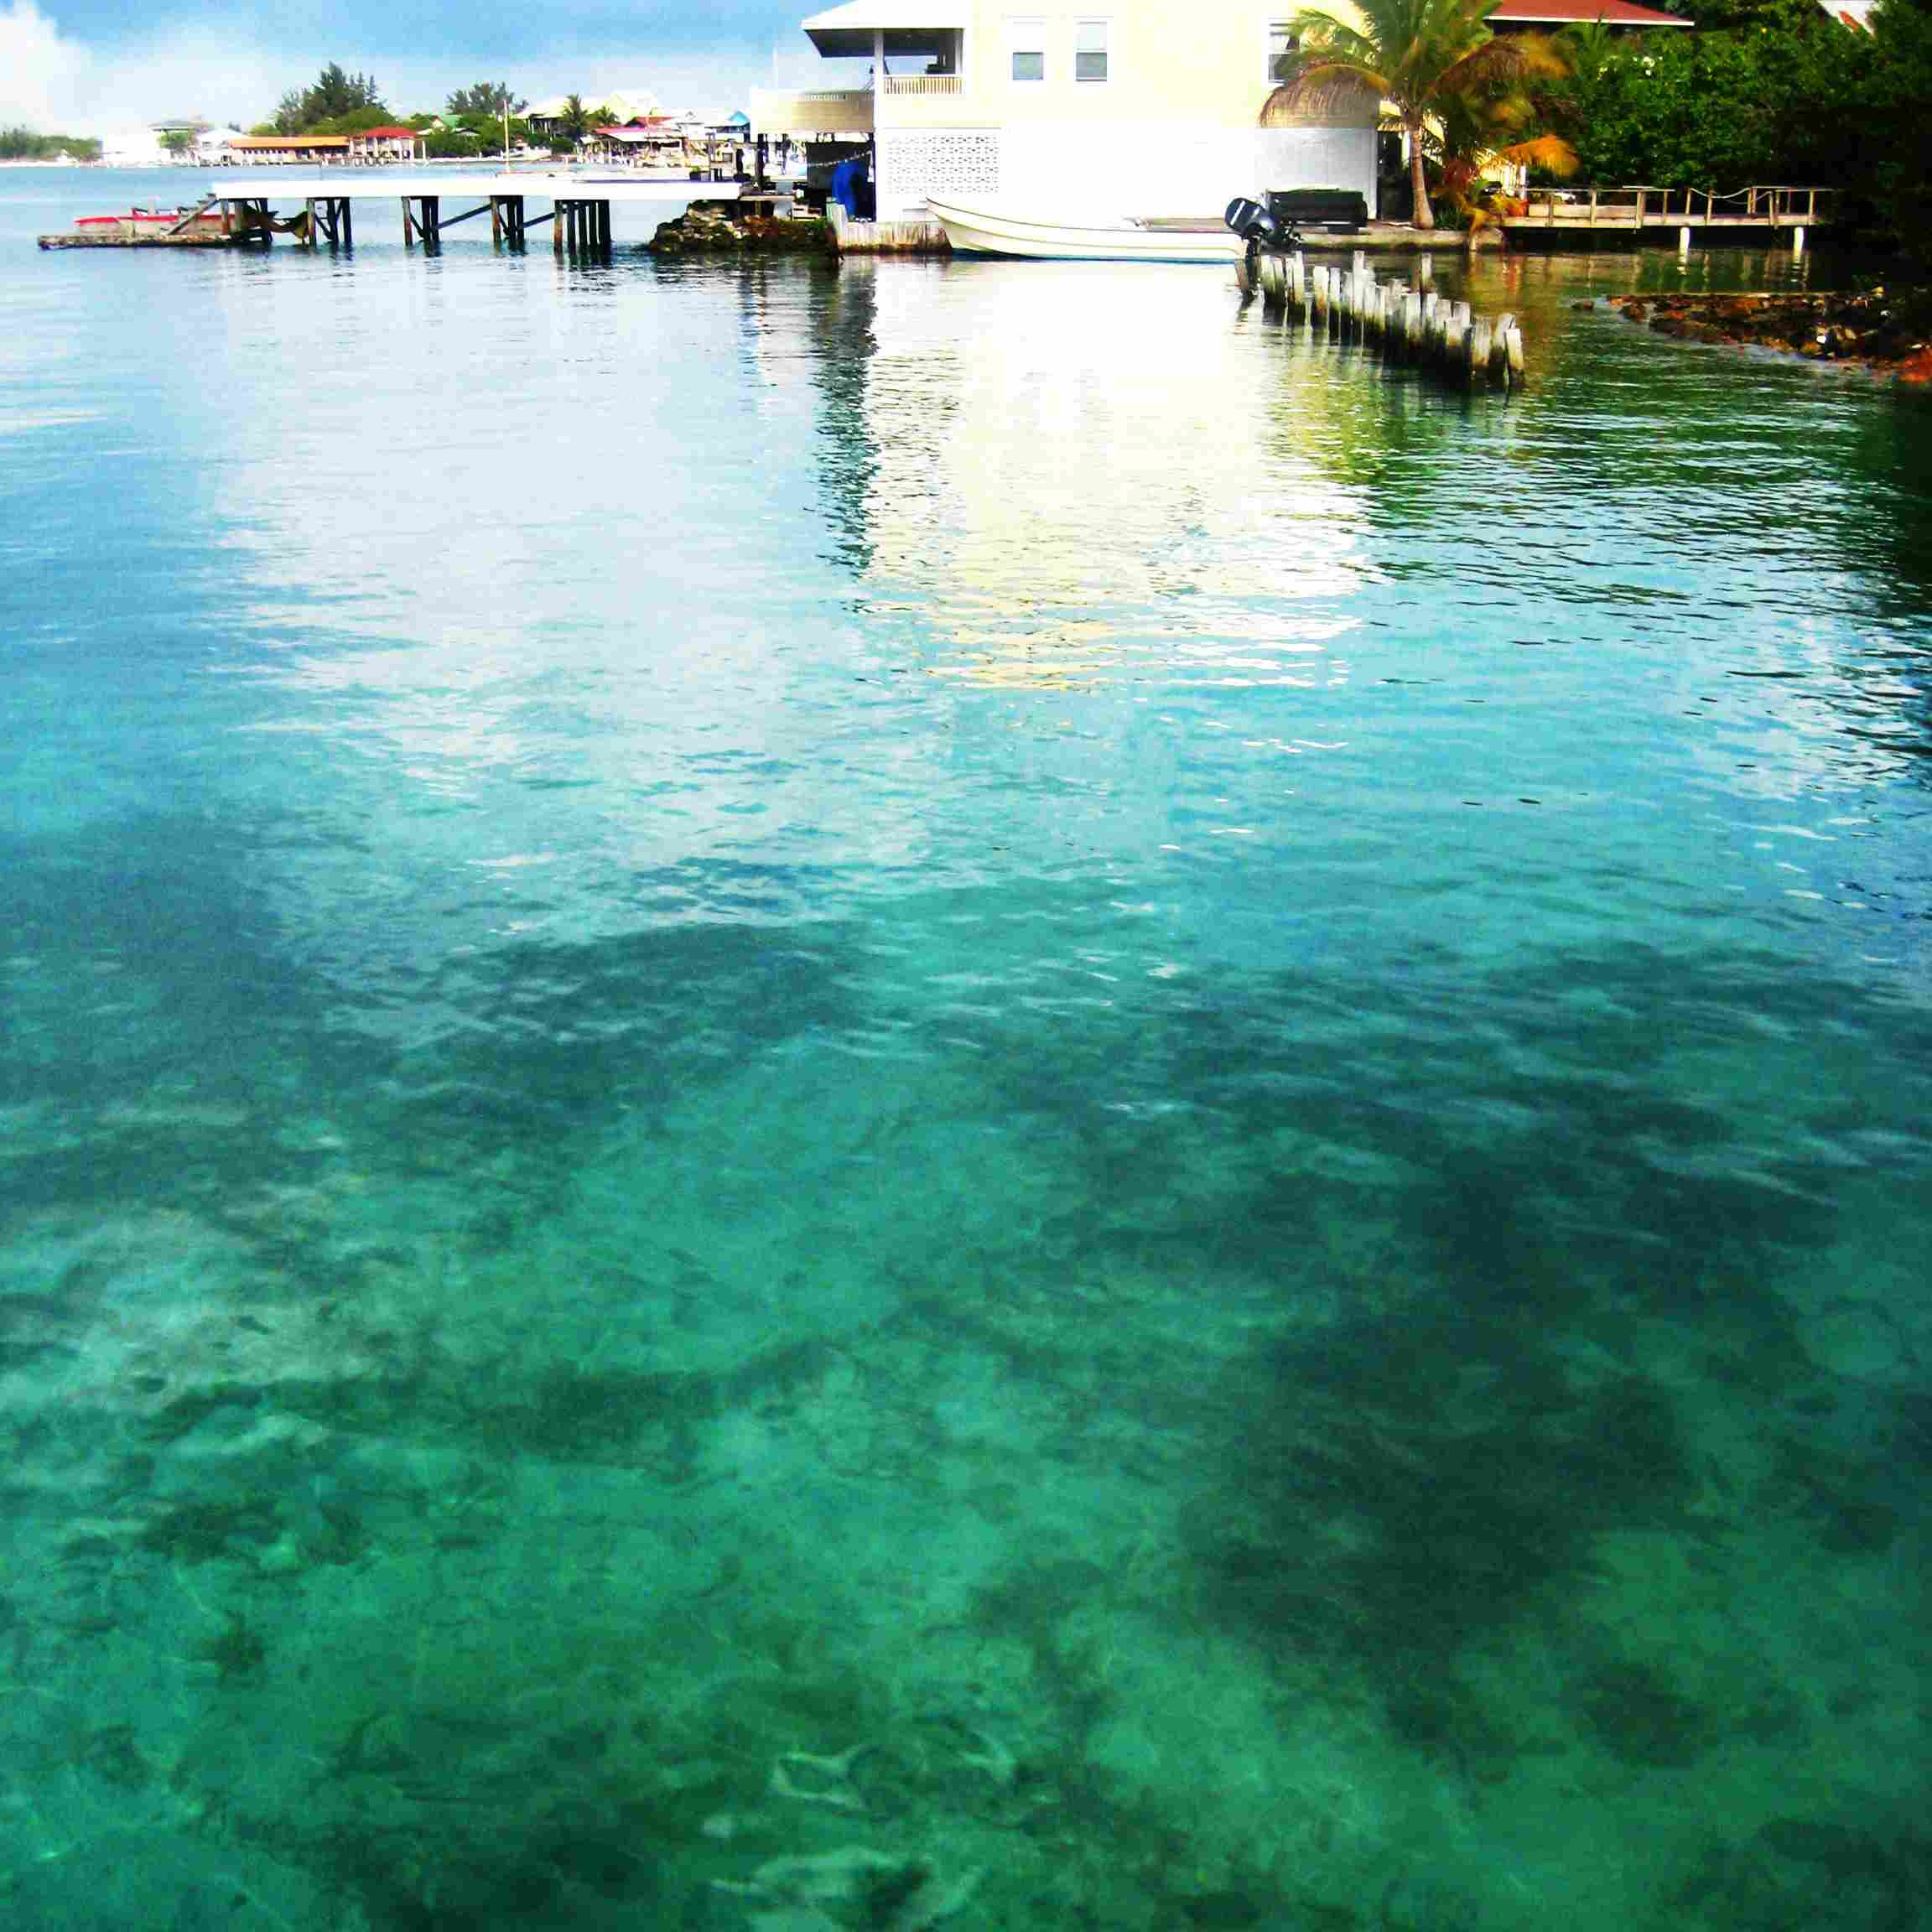 The clear blue water on Utila Island